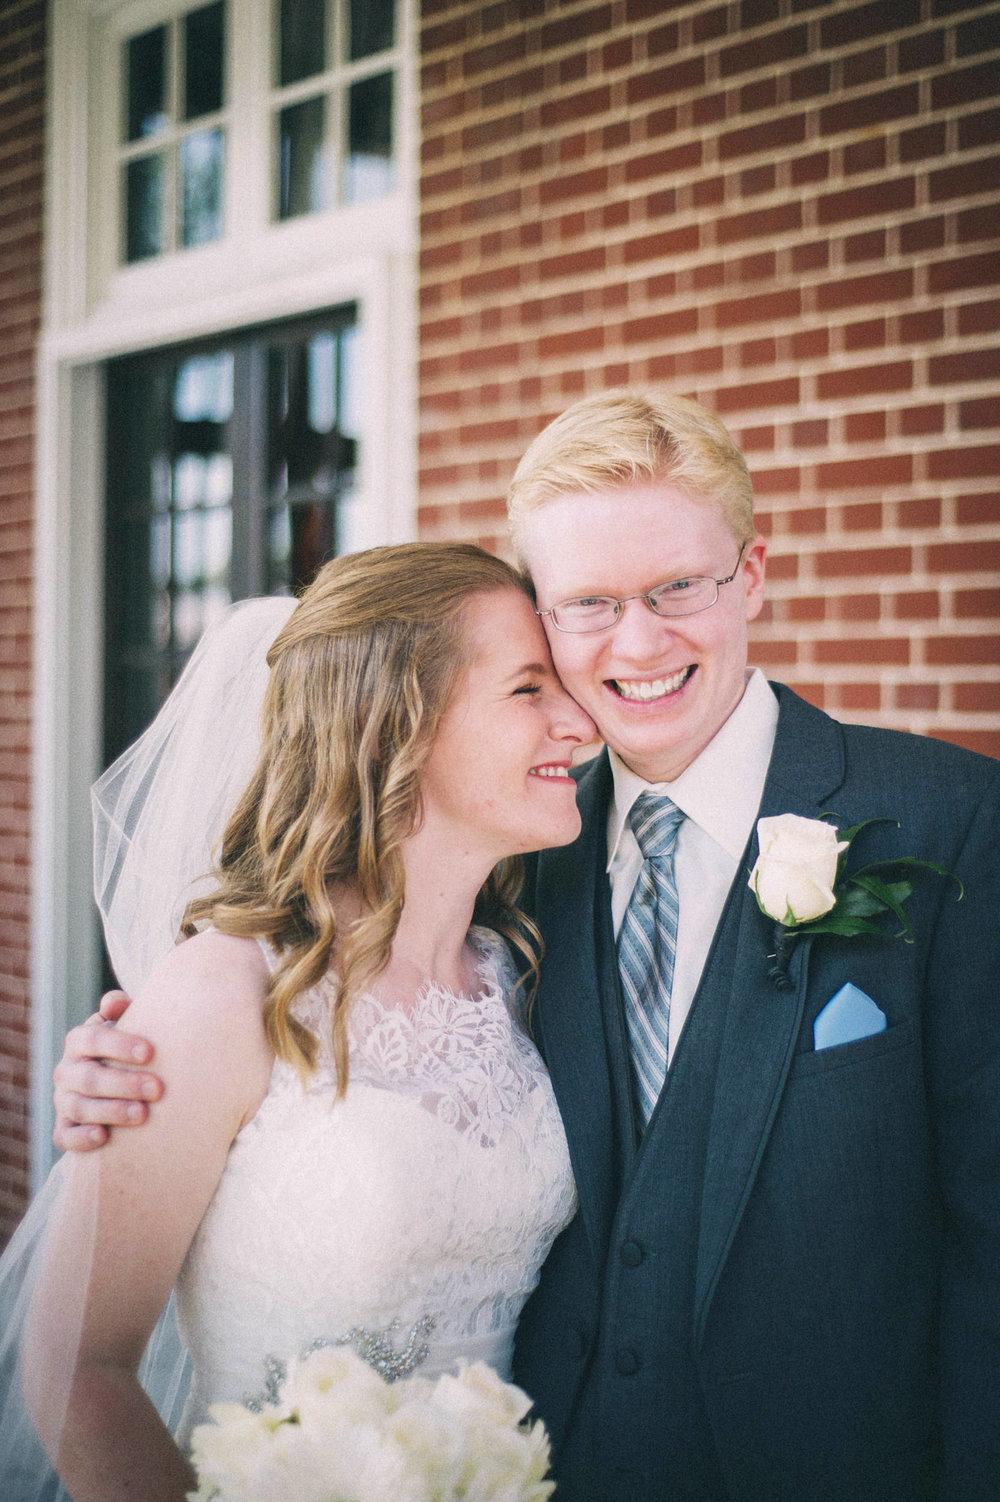 Jenna-Patrick-Garden-Court-Presbyterian-Seminary-Wedding-Louisville-Kentucky-Sarah-Katherine-Davis-Photography-60.jpg